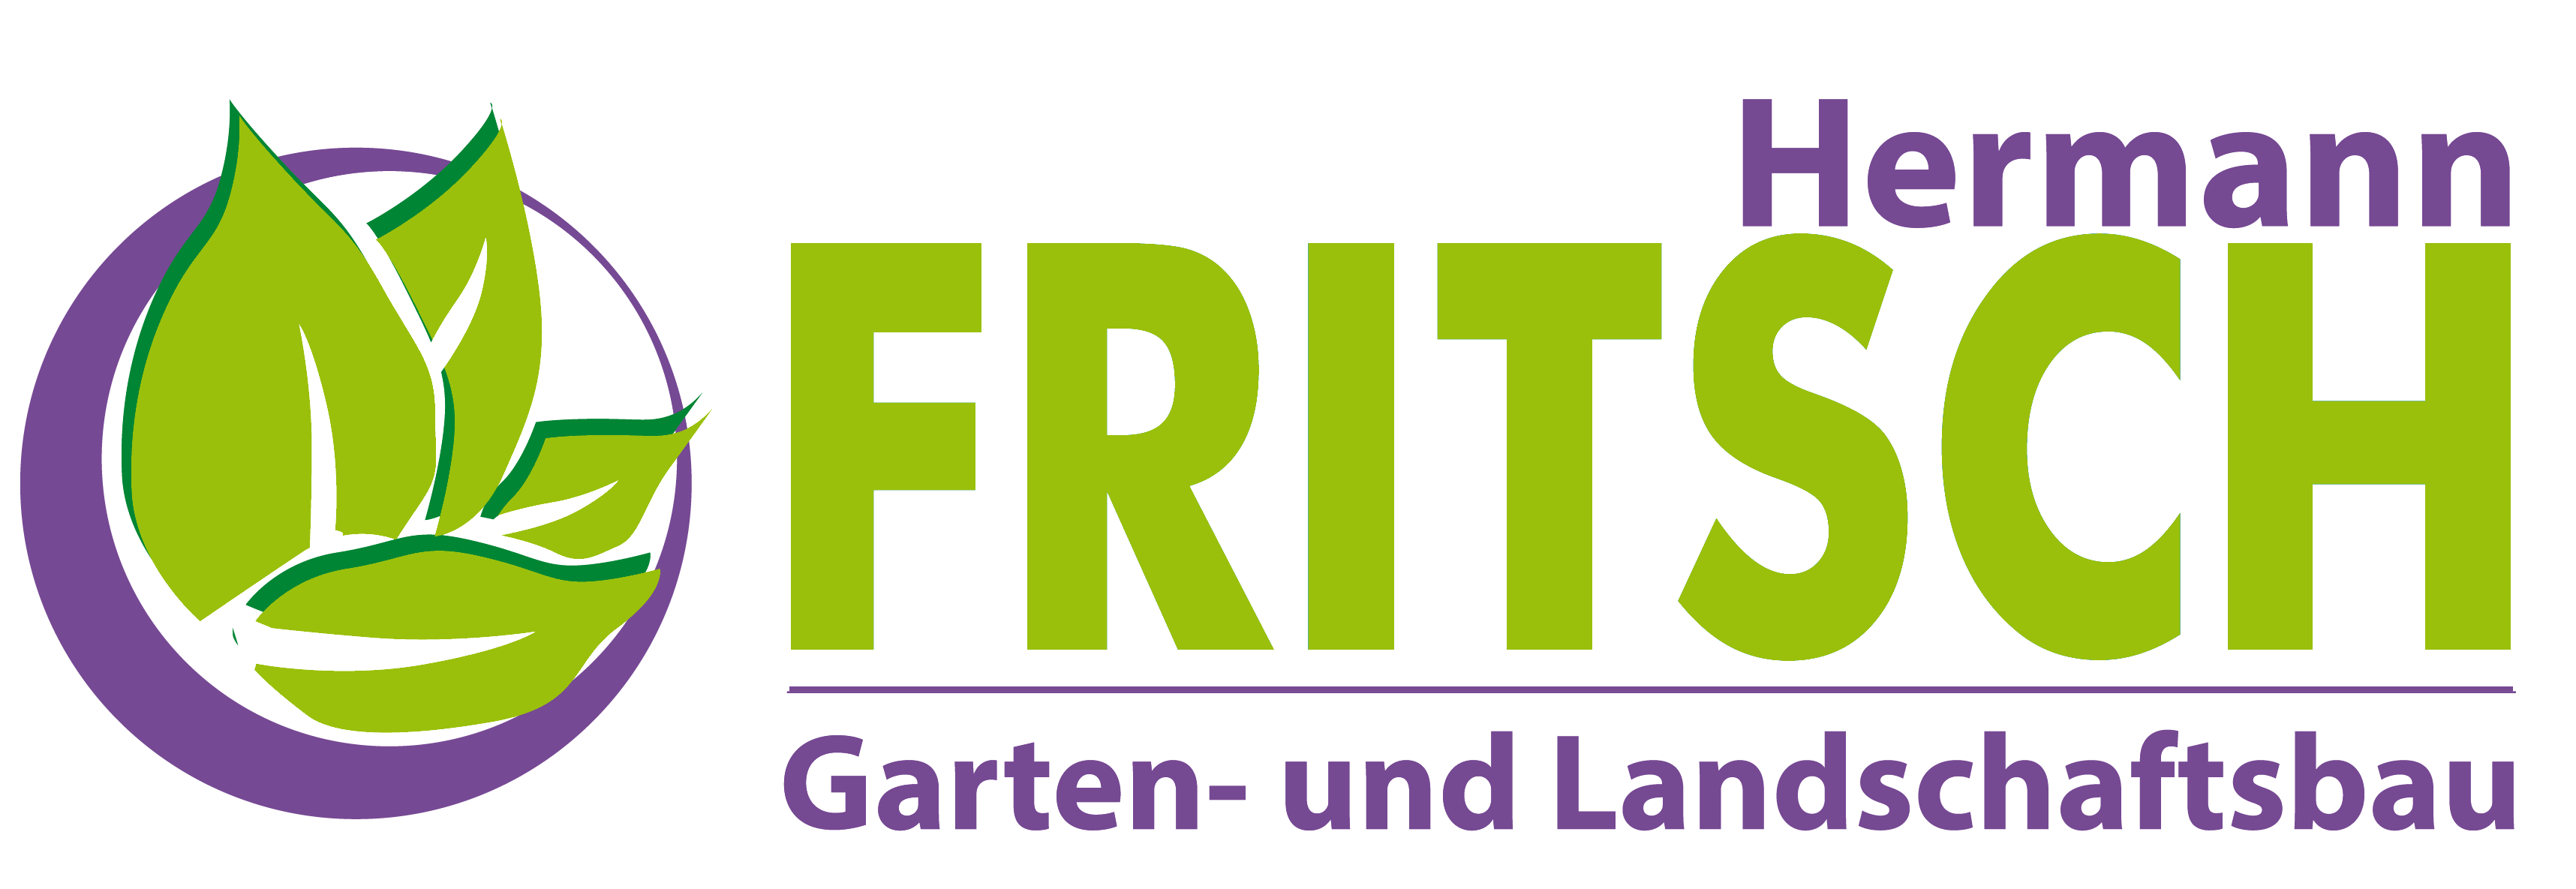 Fritsch Gartenbau Gartengestaltung Home